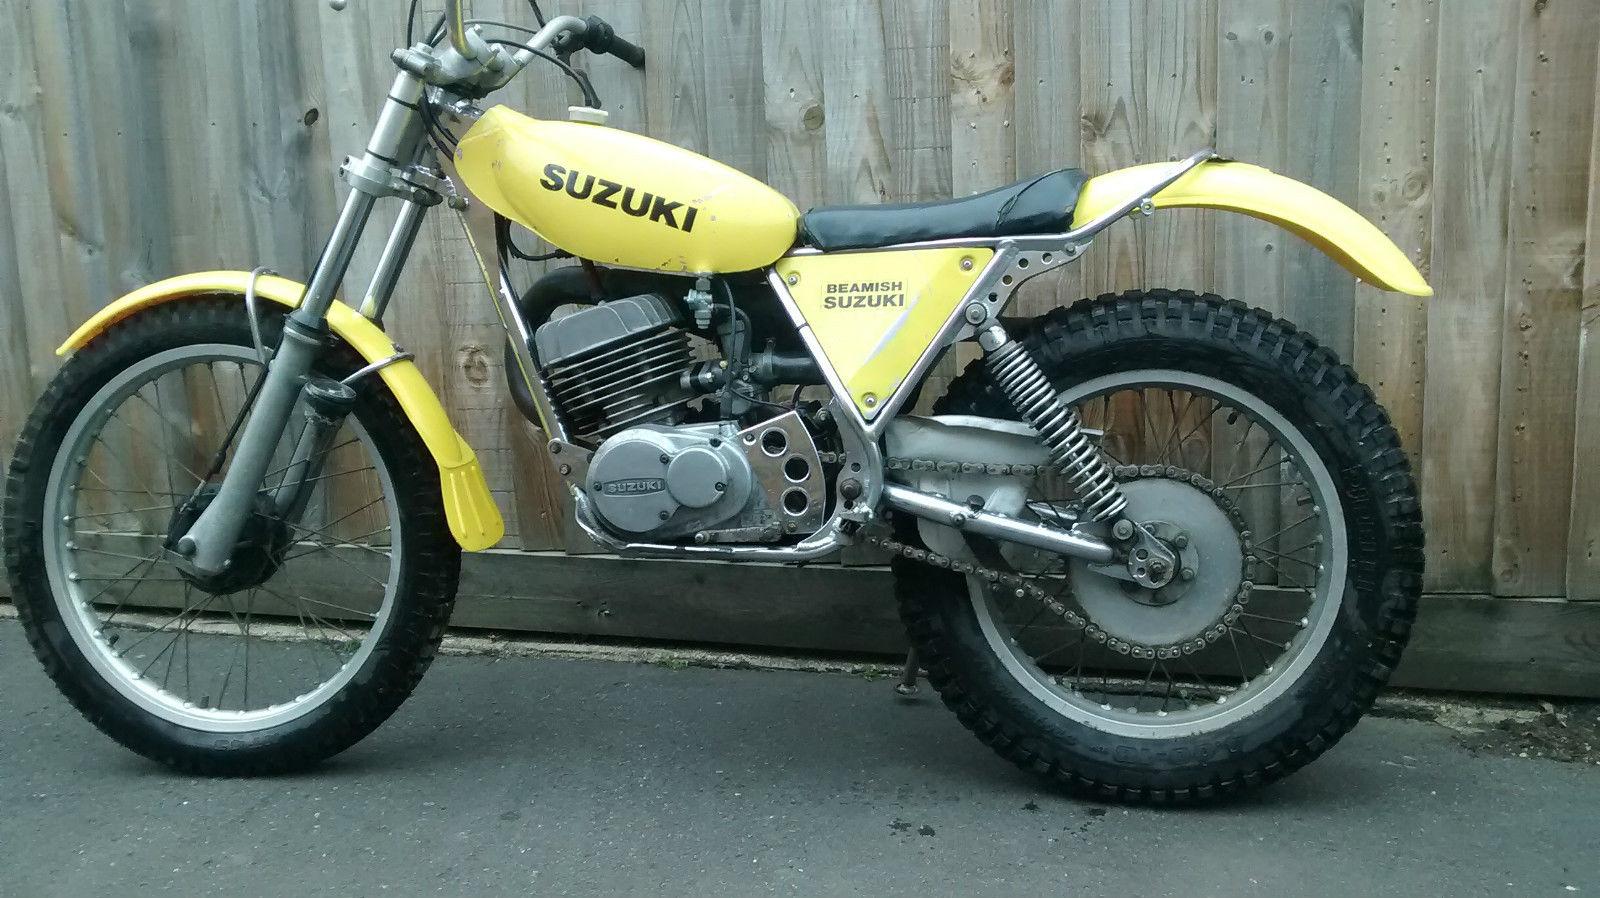 Suzuki Rl Beamish For Sale